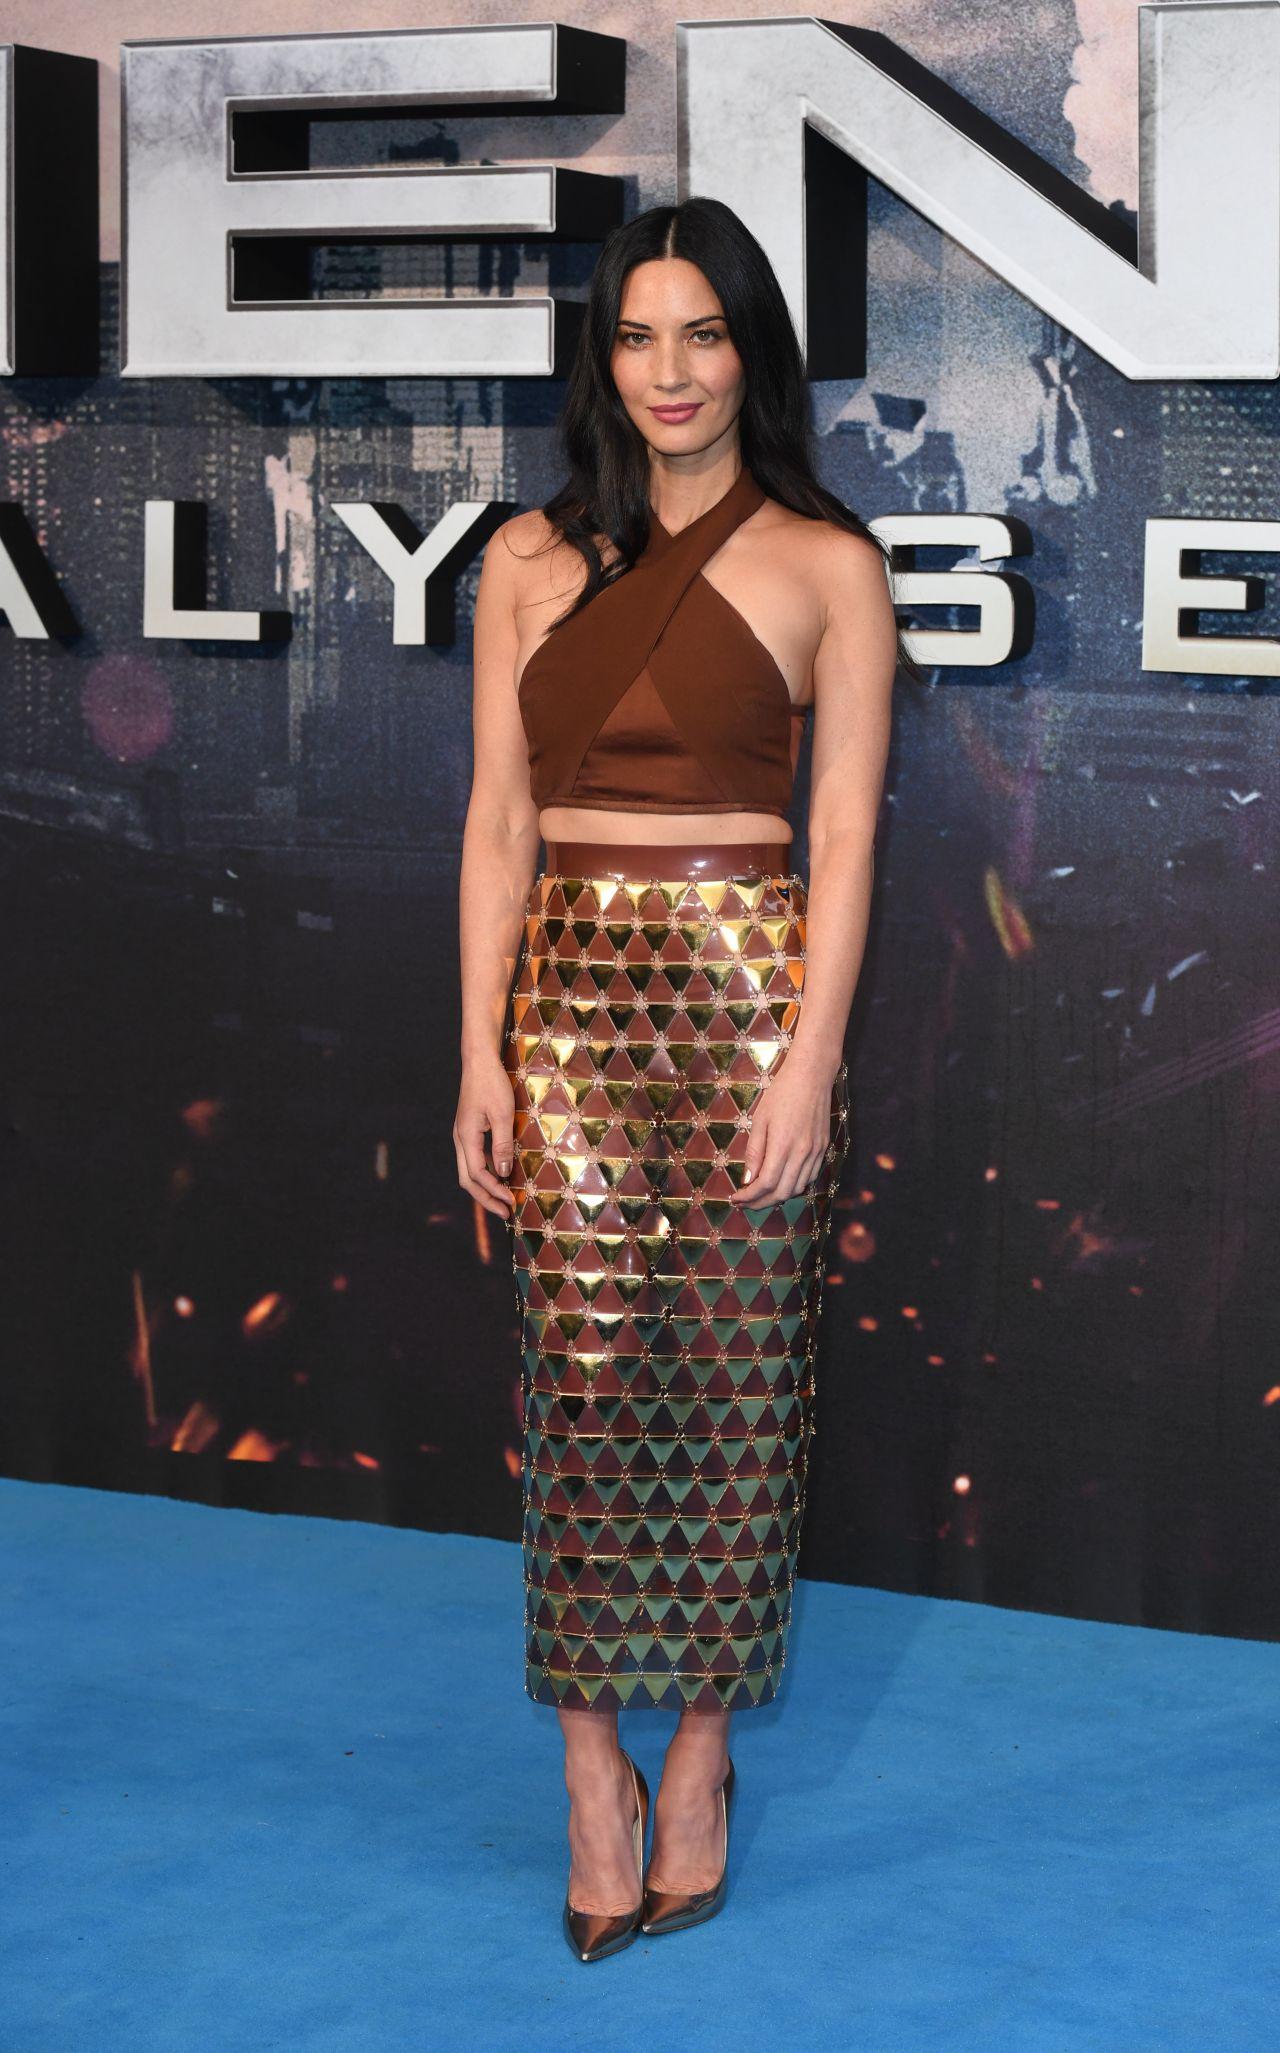 Olivia Munn X Men Apocalypse Premiere In London Uk 5 9